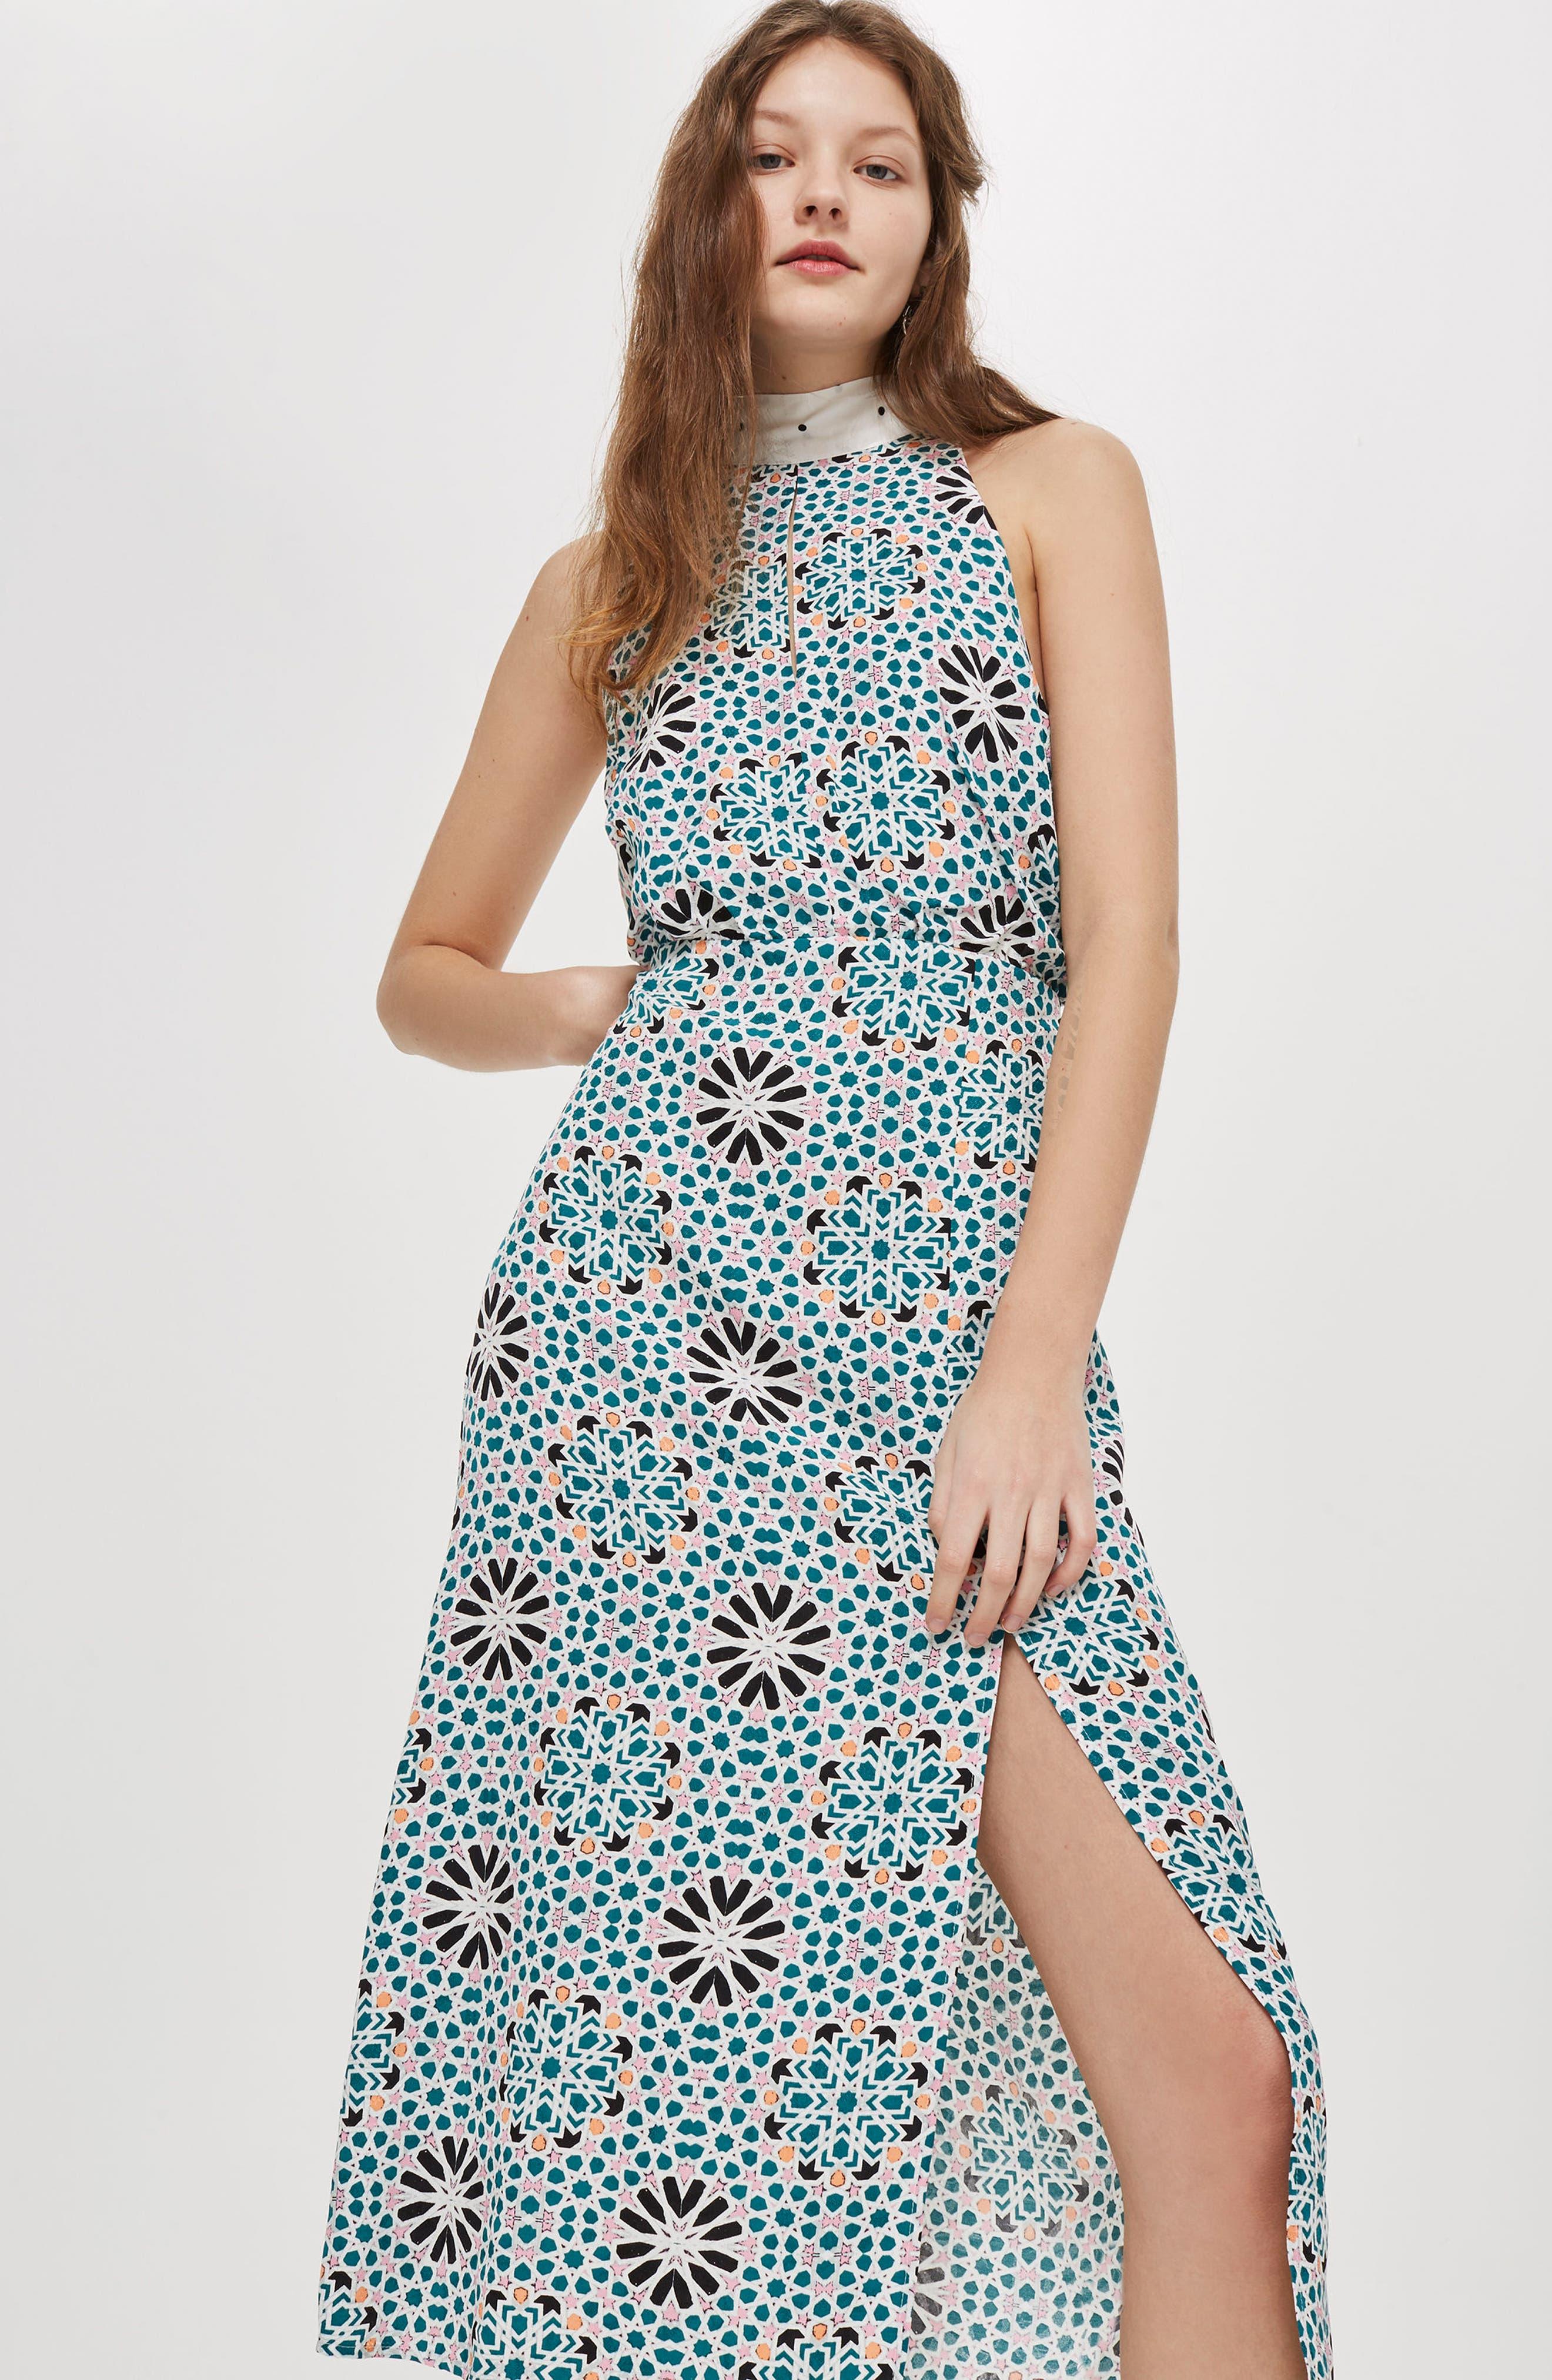 Geo Tie Neck Halter Midi Dress,                             Alternate thumbnail 2, color,                             Blue Multi